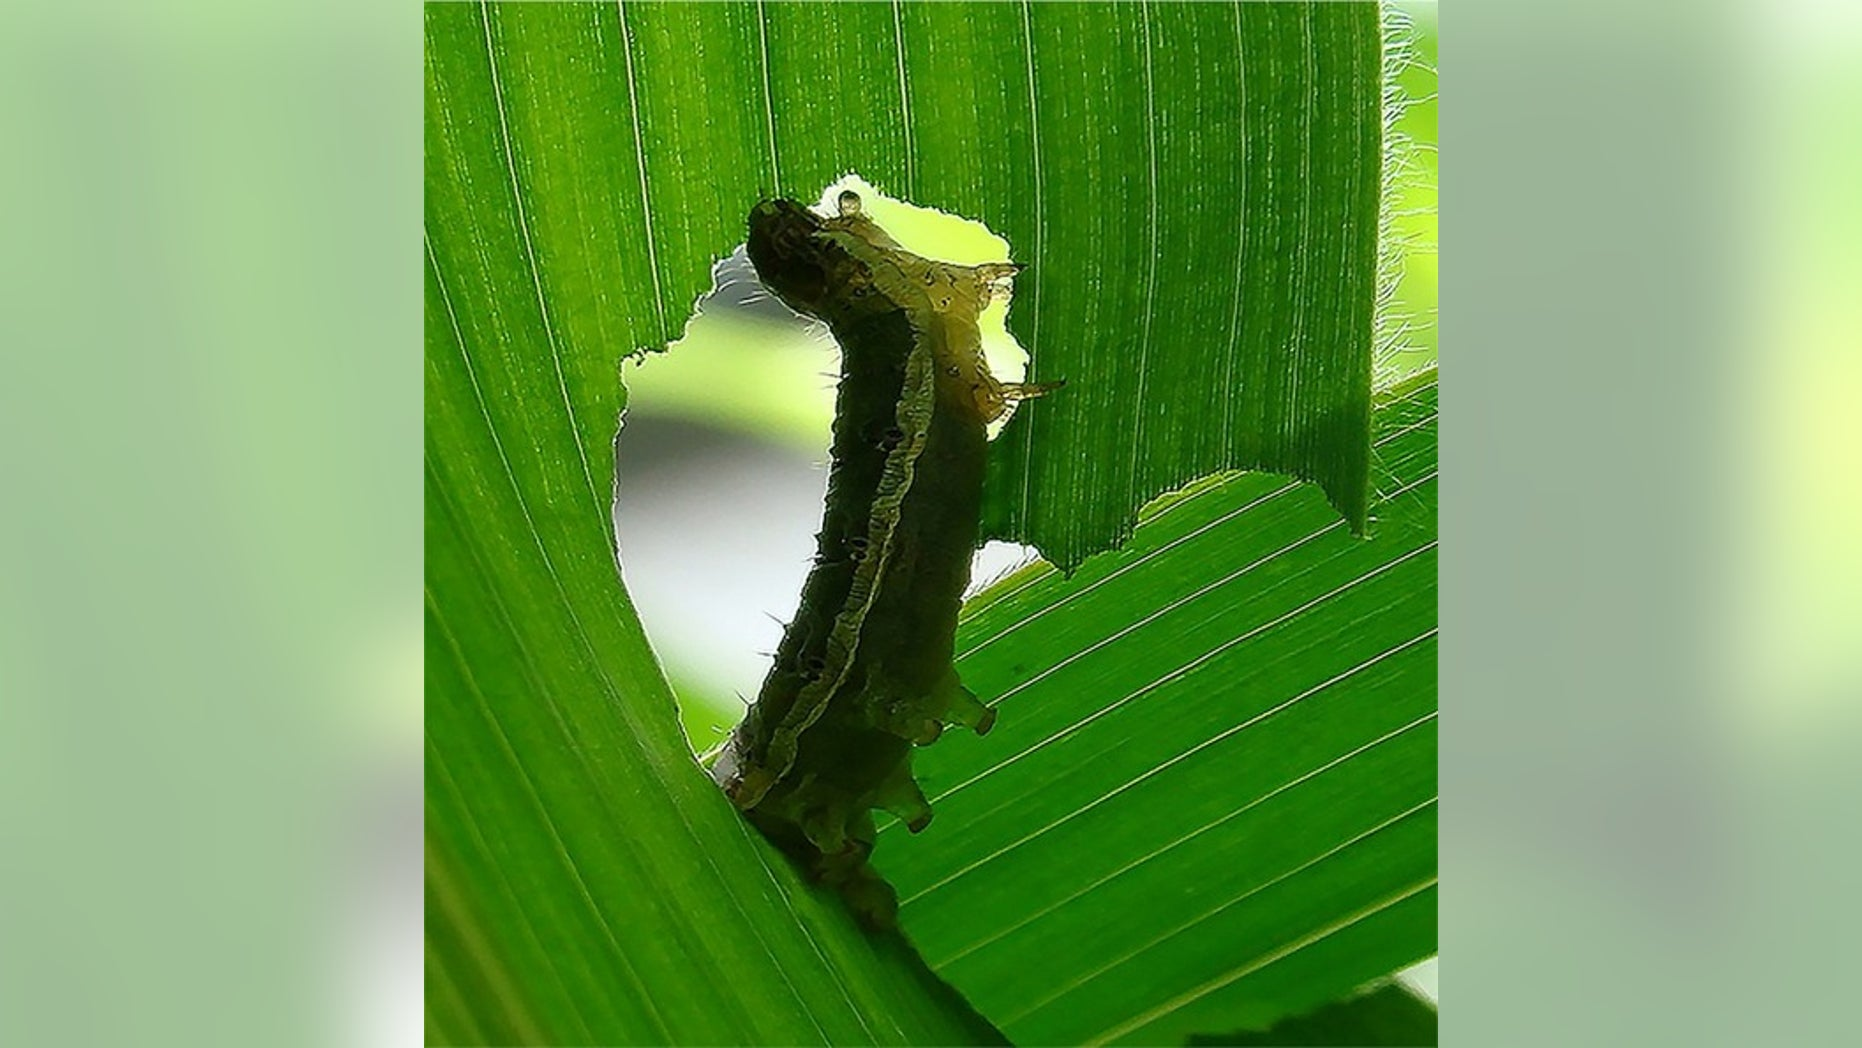 A caterpillar eating a corn leaf.